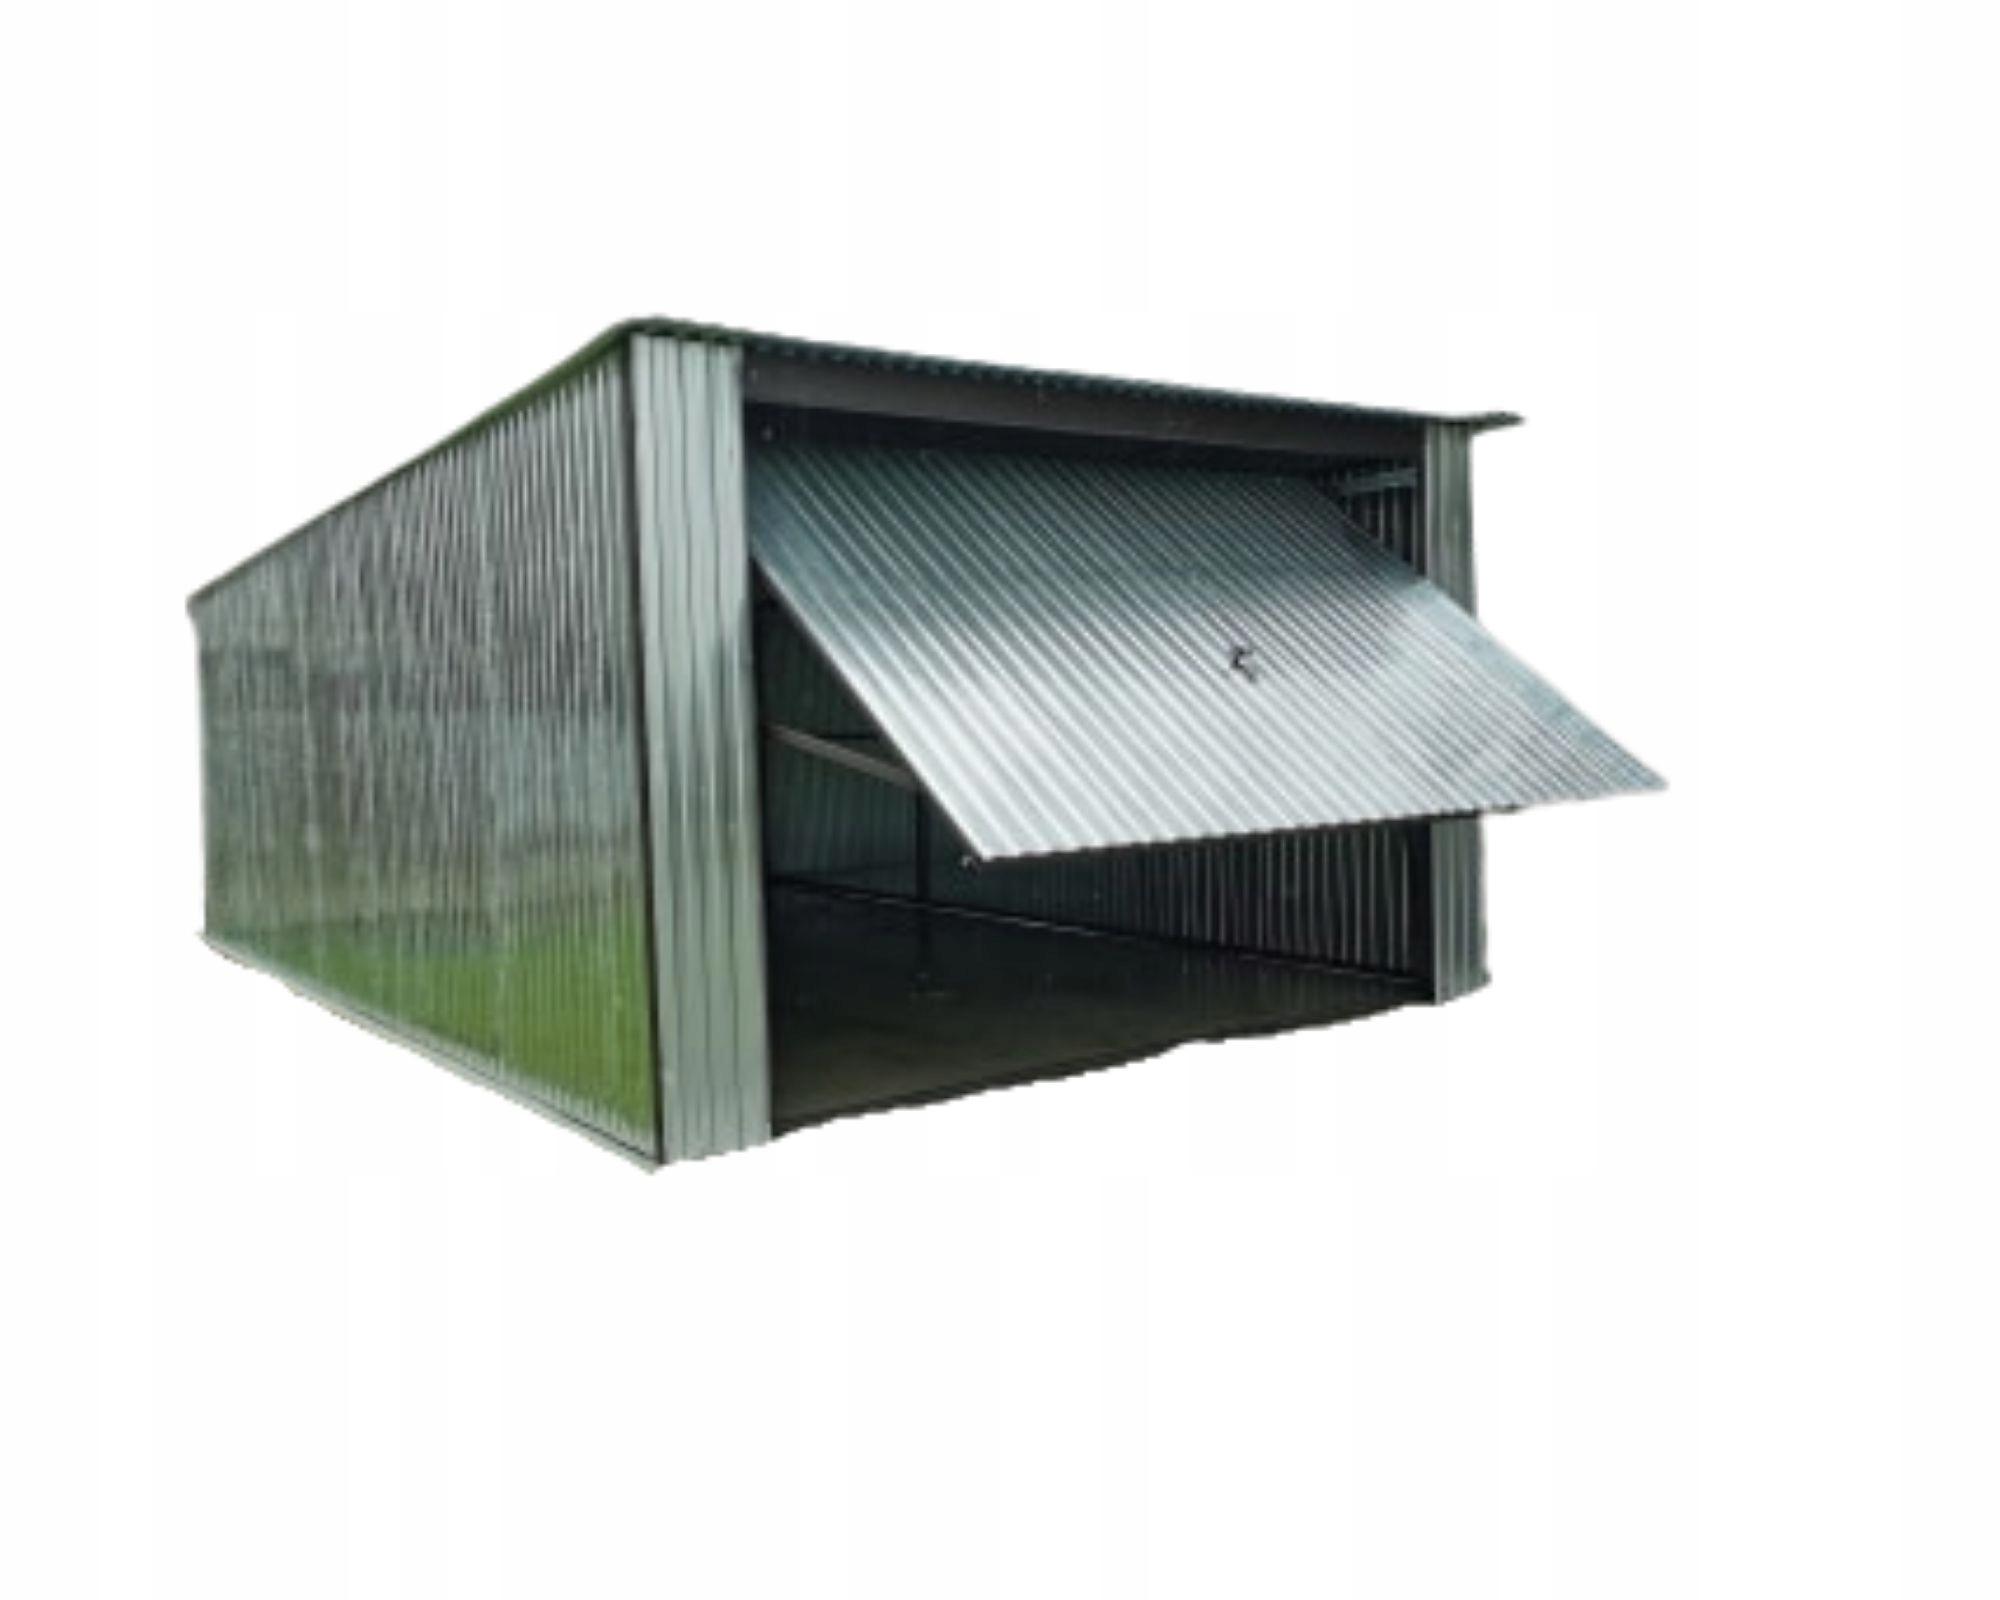 Tin Garage Blaszak Жестяные гаражи 4х6 ворот